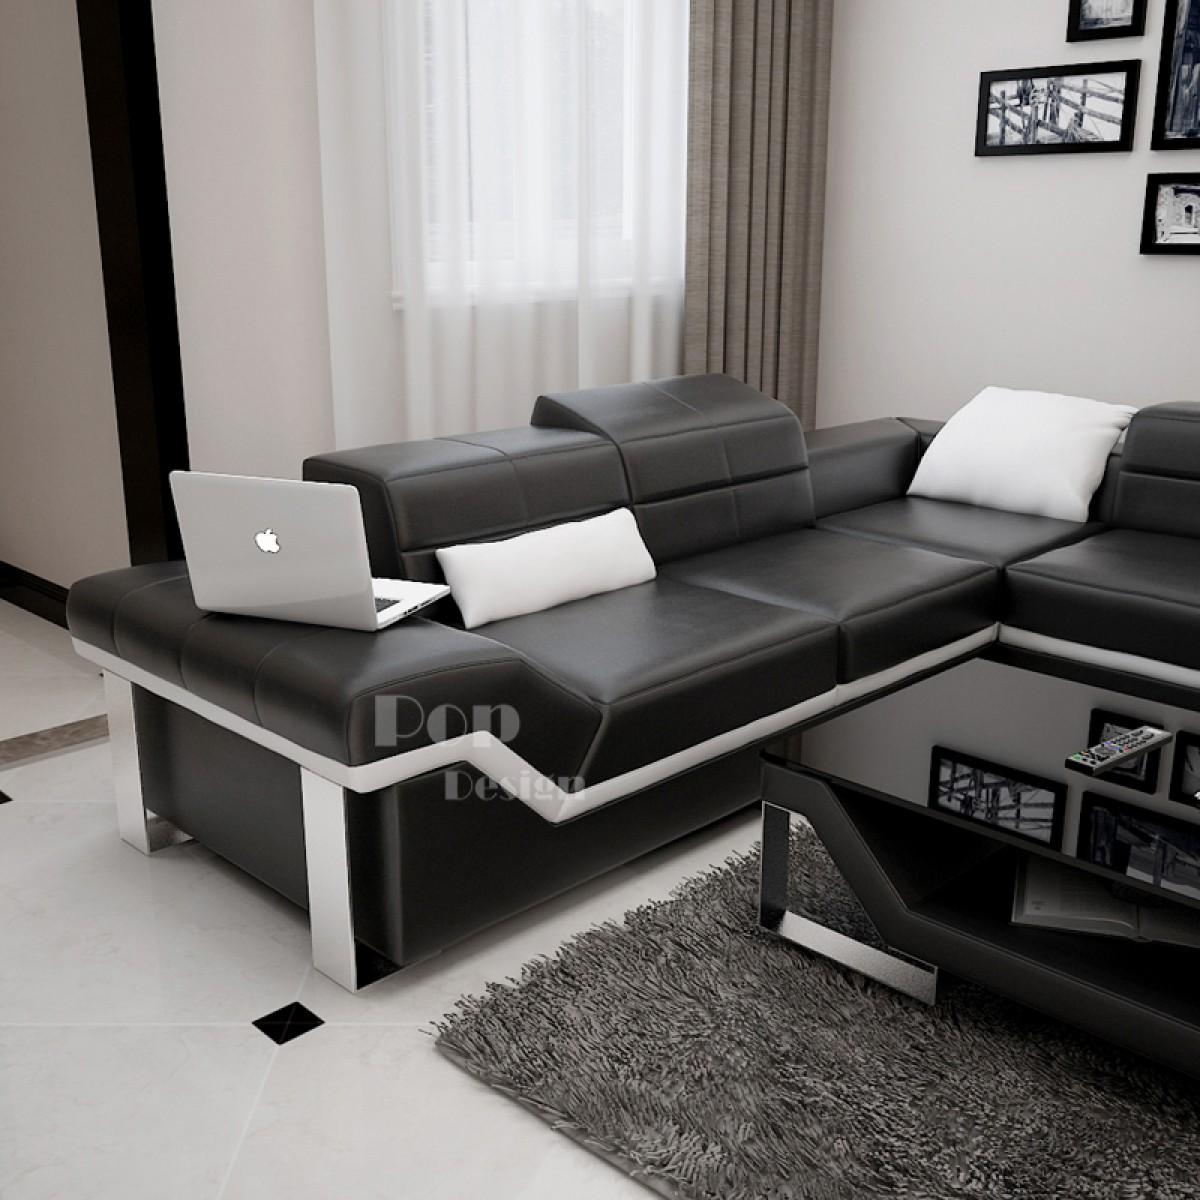 canap d 39 angle design en cuir pleine fleur torino l. Black Bedroom Furniture Sets. Home Design Ideas